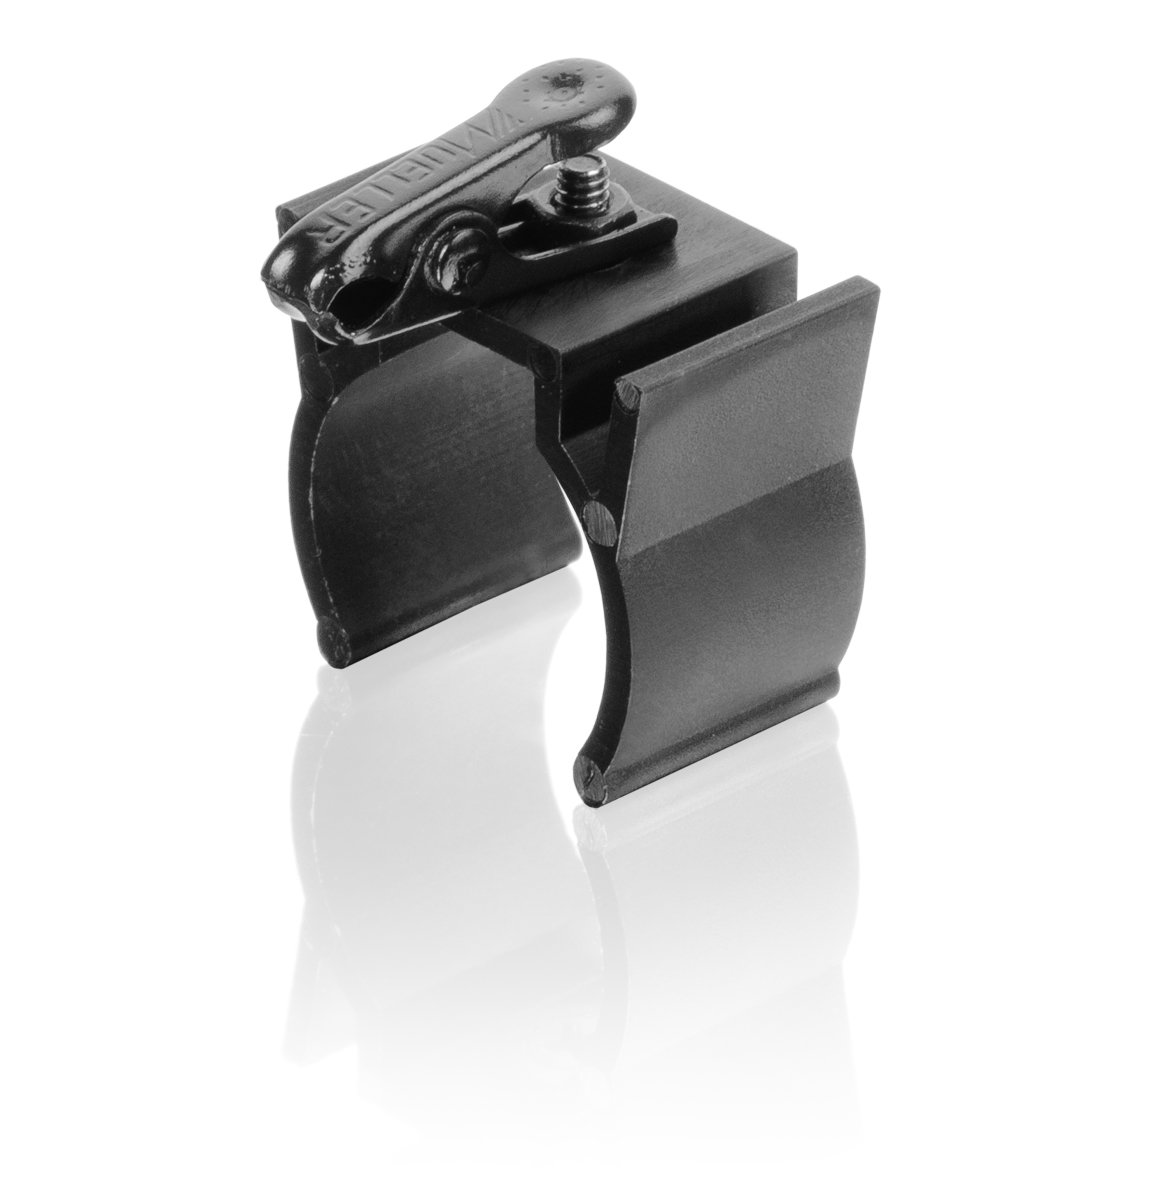 Countryman A2CFLUTE  ISOMAX 2 Flute Clip (Black)